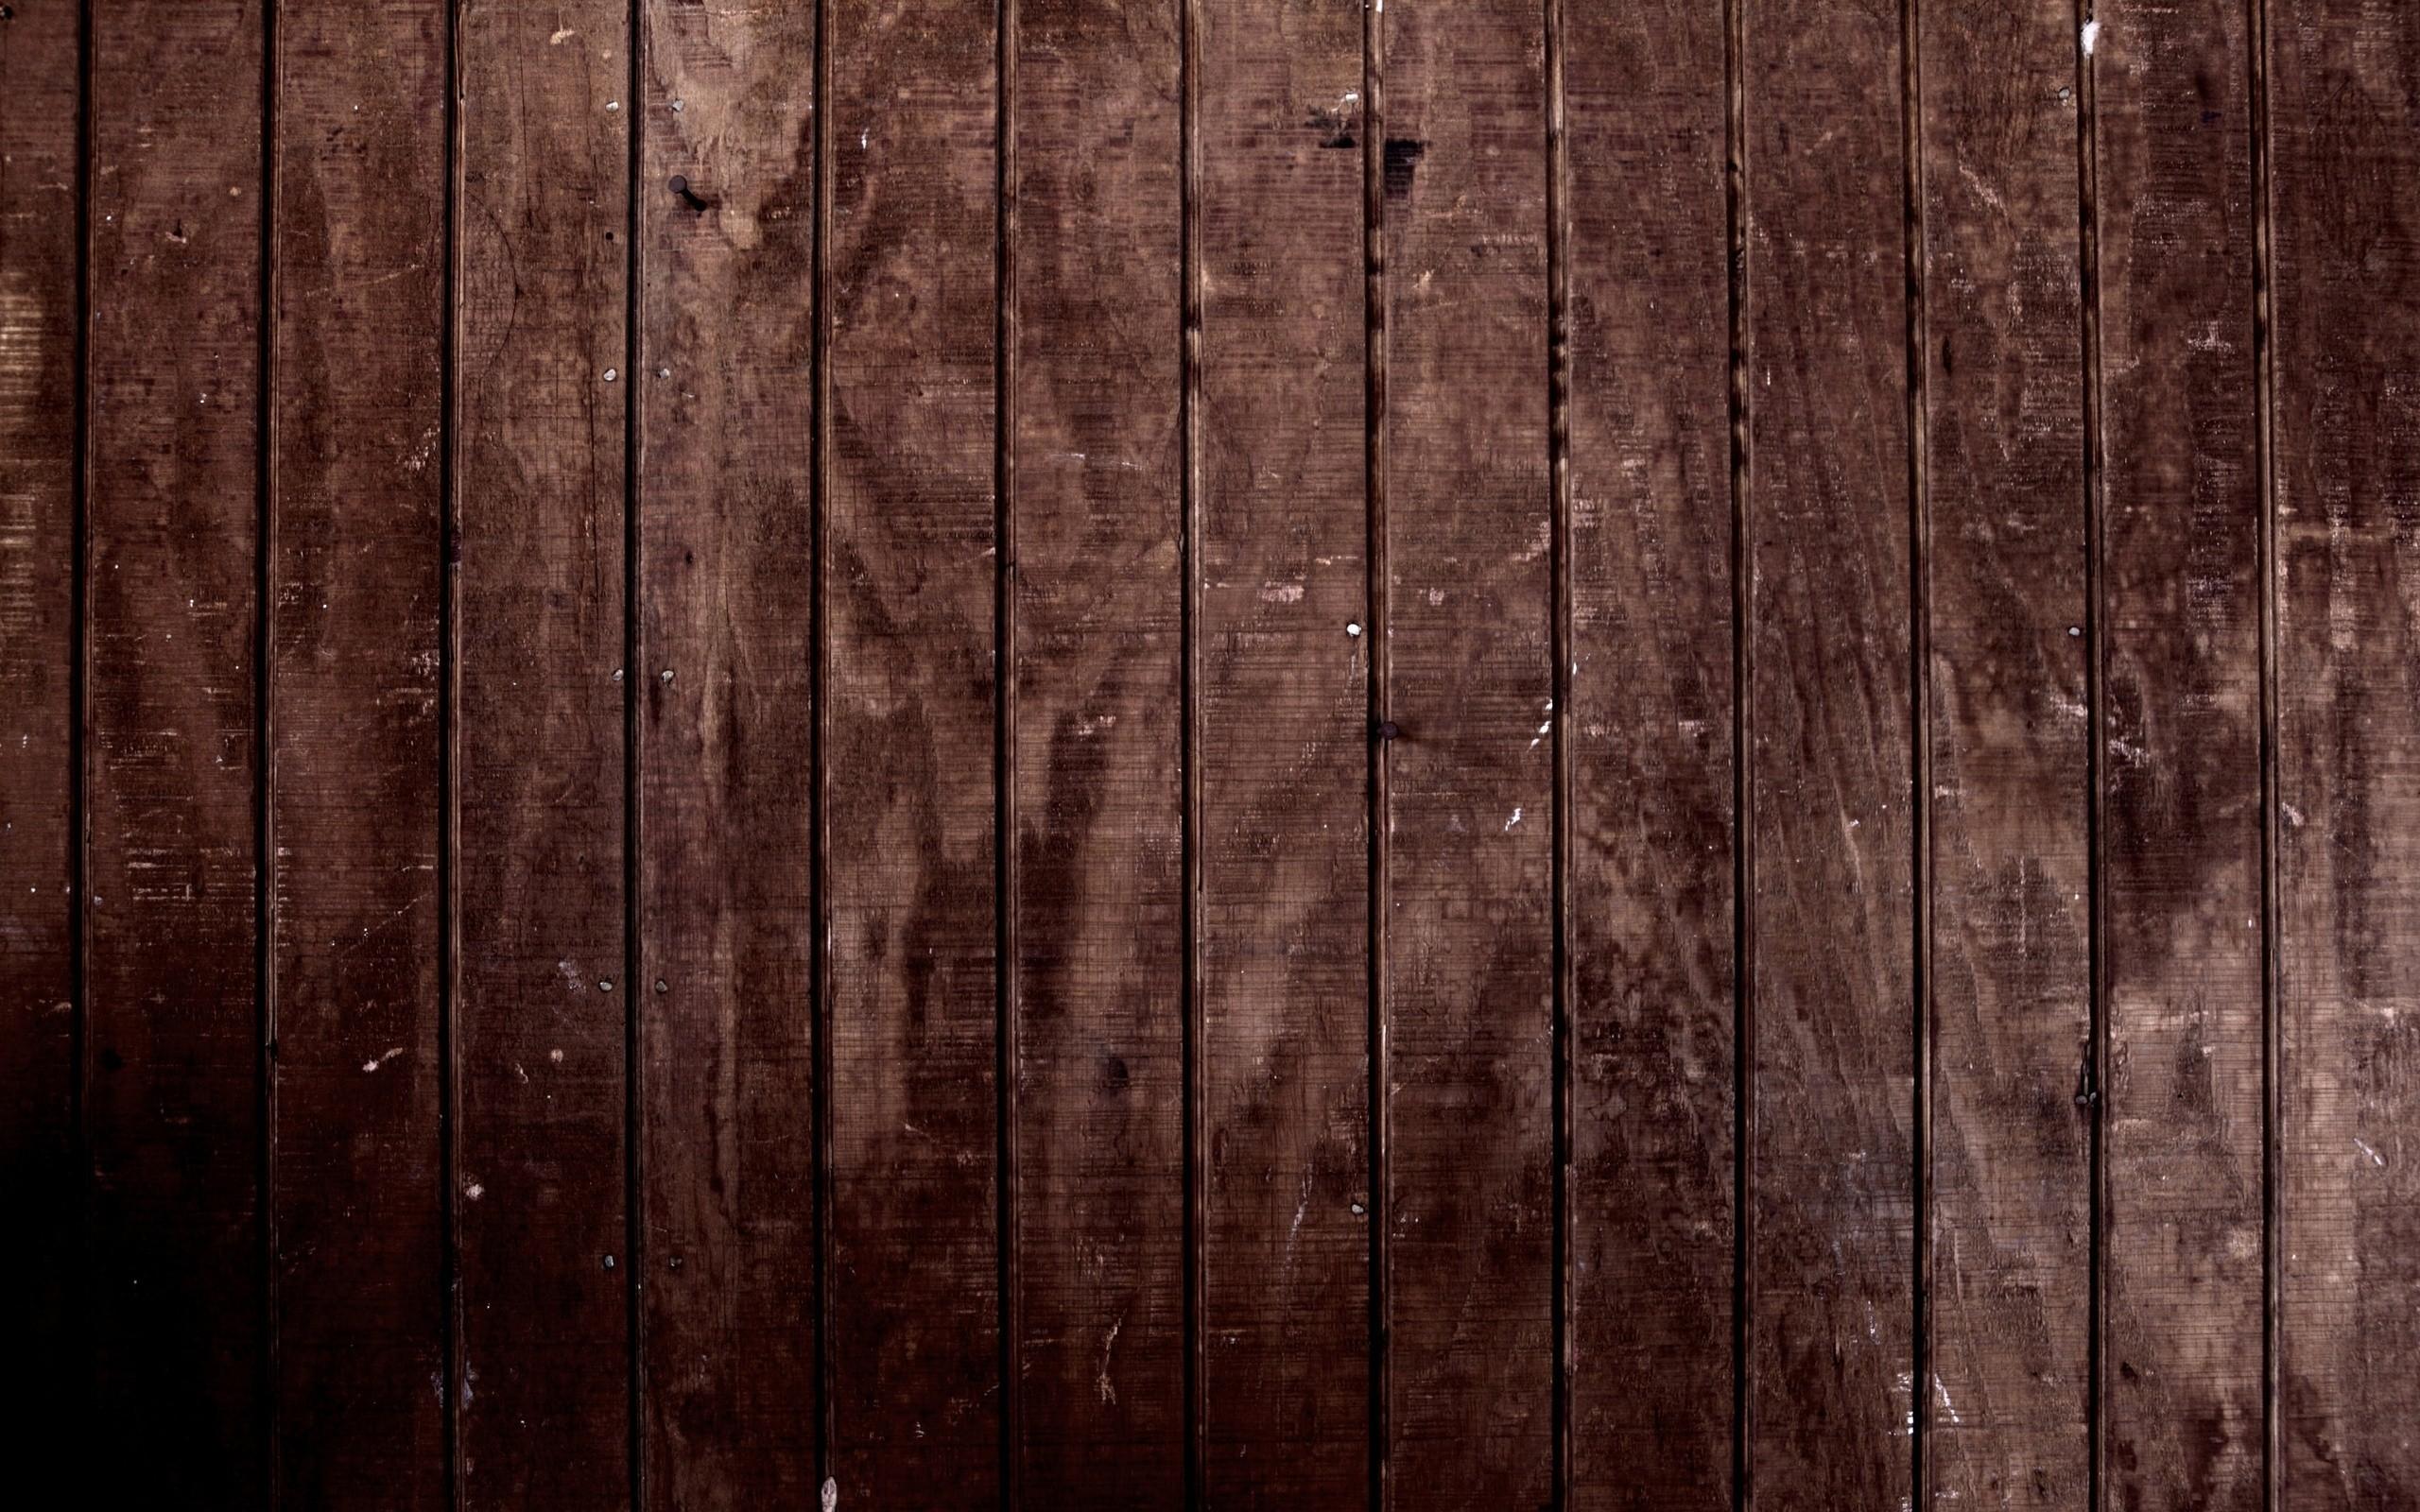 1920x1080 High Resolution Wood Tree Wallpaper 19201080 Full Size